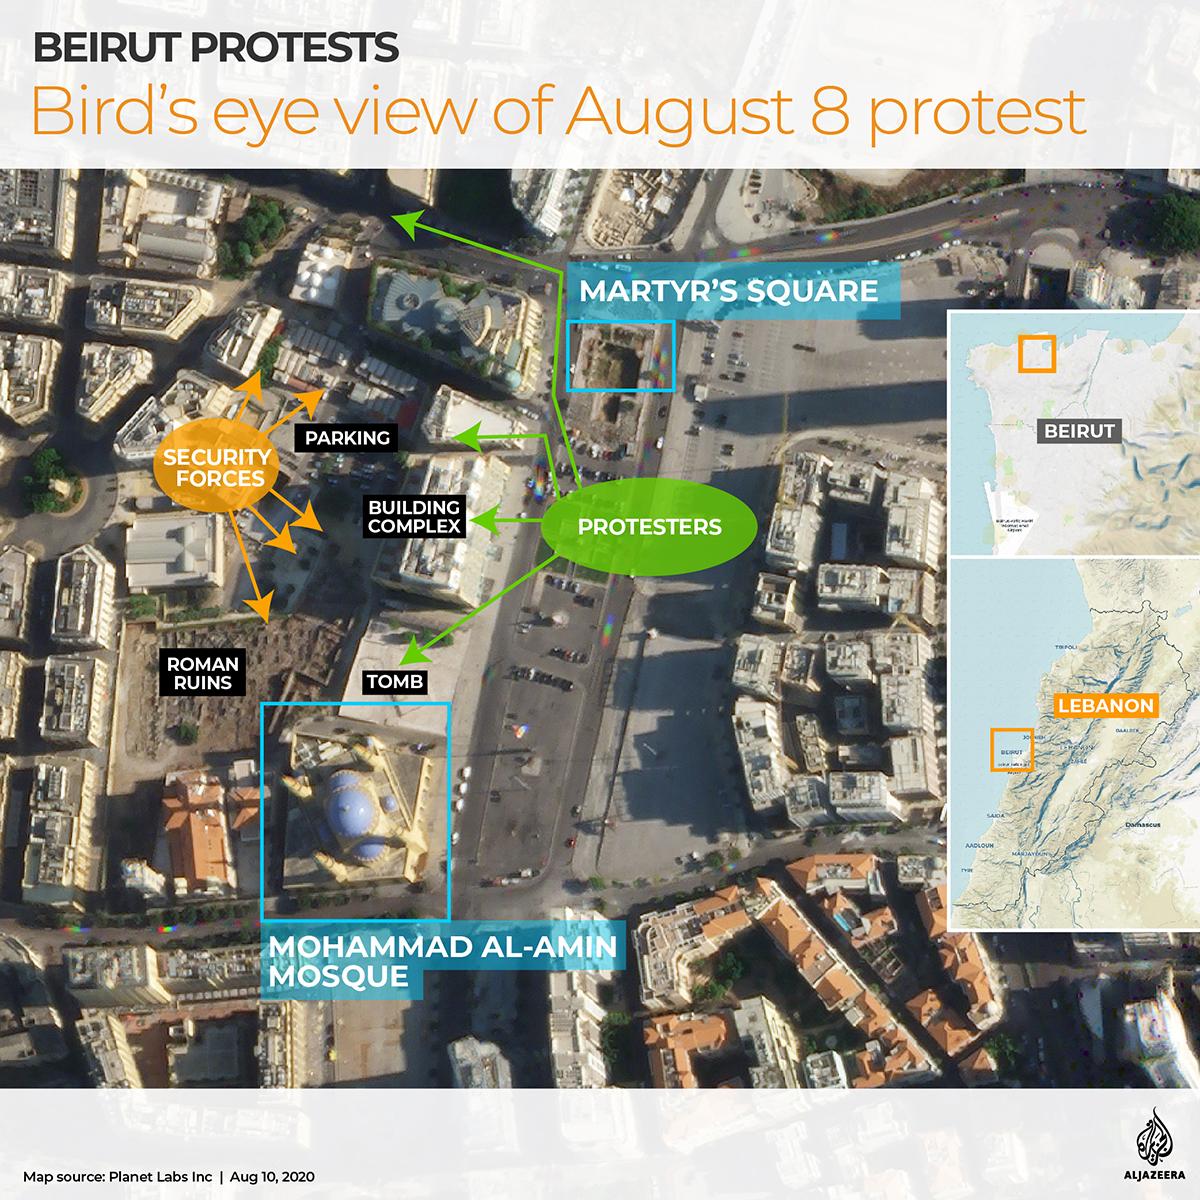 Bird's eye view Beirut protest August 8